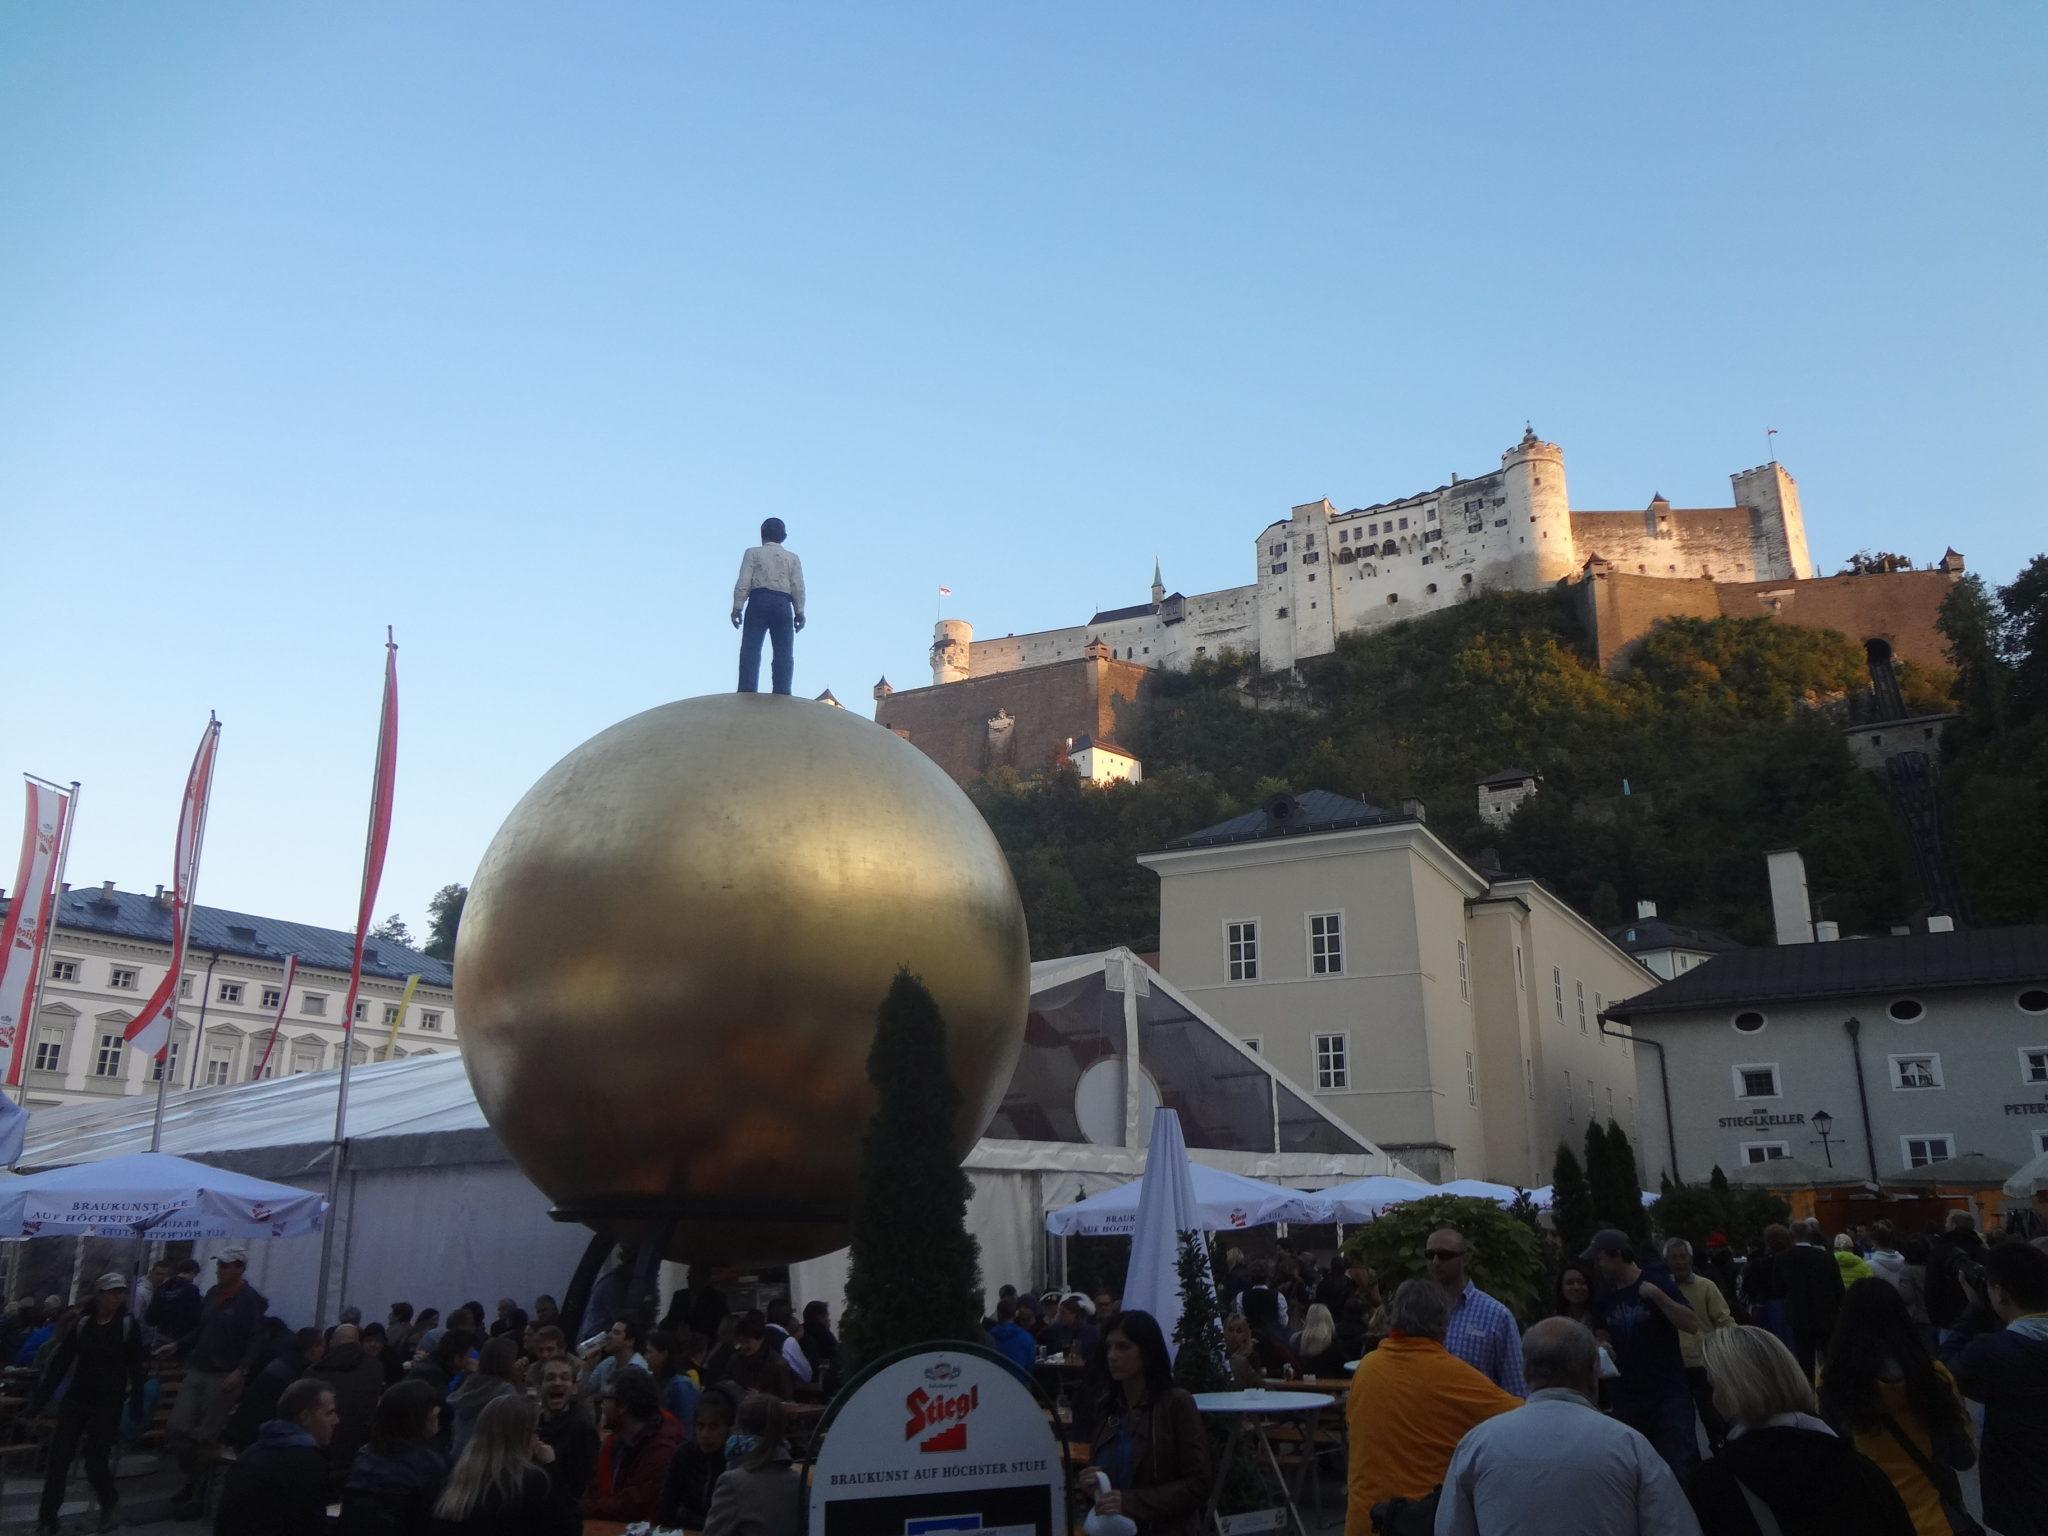 Subir al castillo en salzburgo